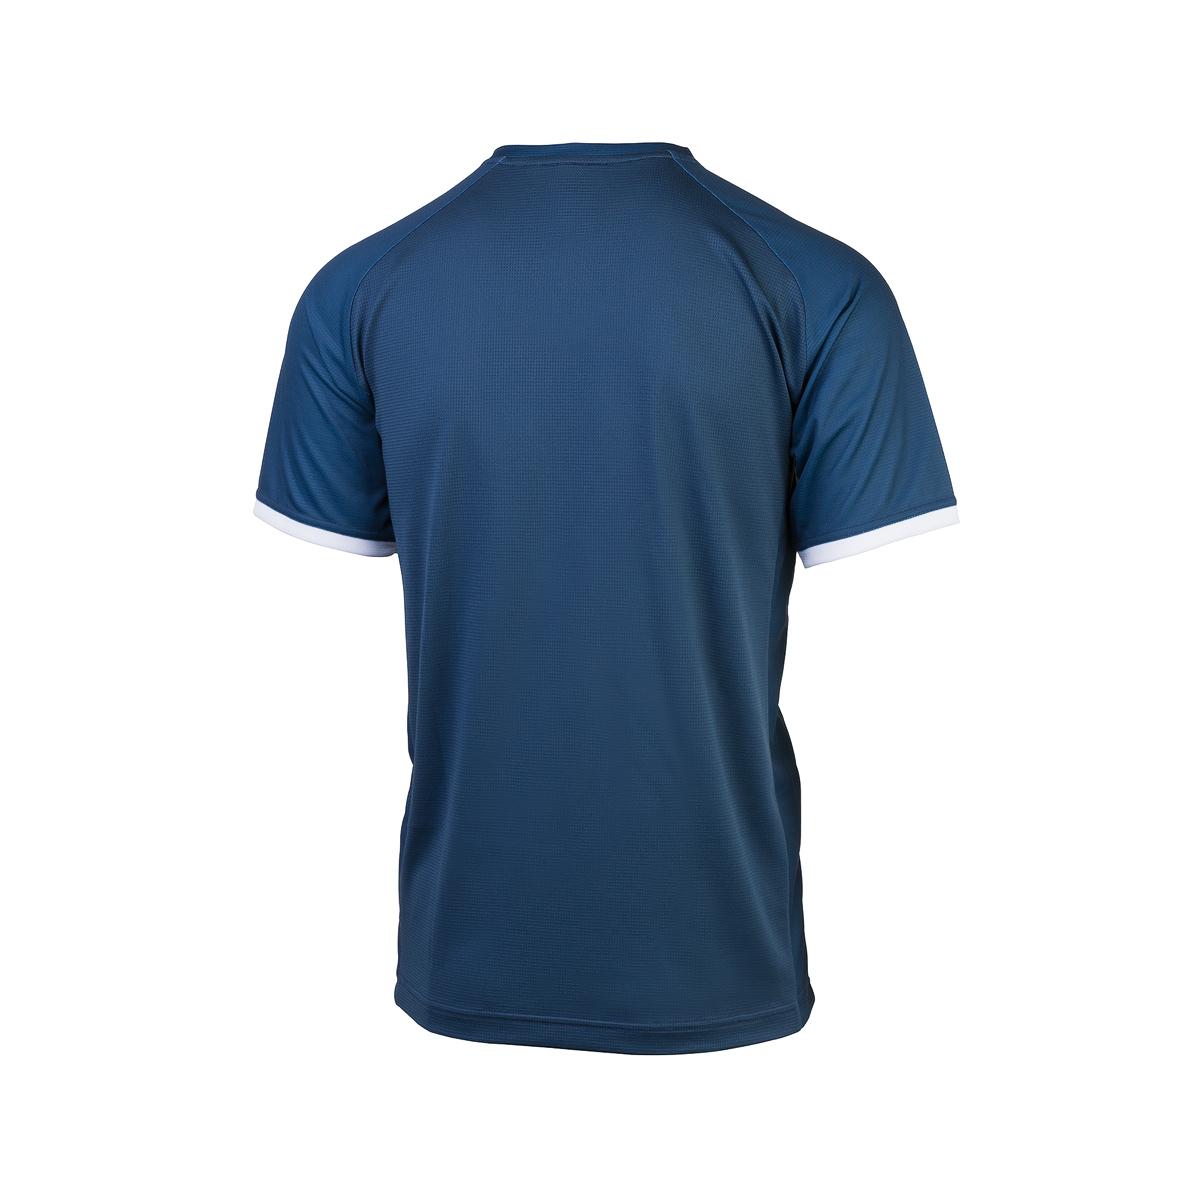 Men's Crew Neck Shirt Badminton TournamentDetailbild - 1